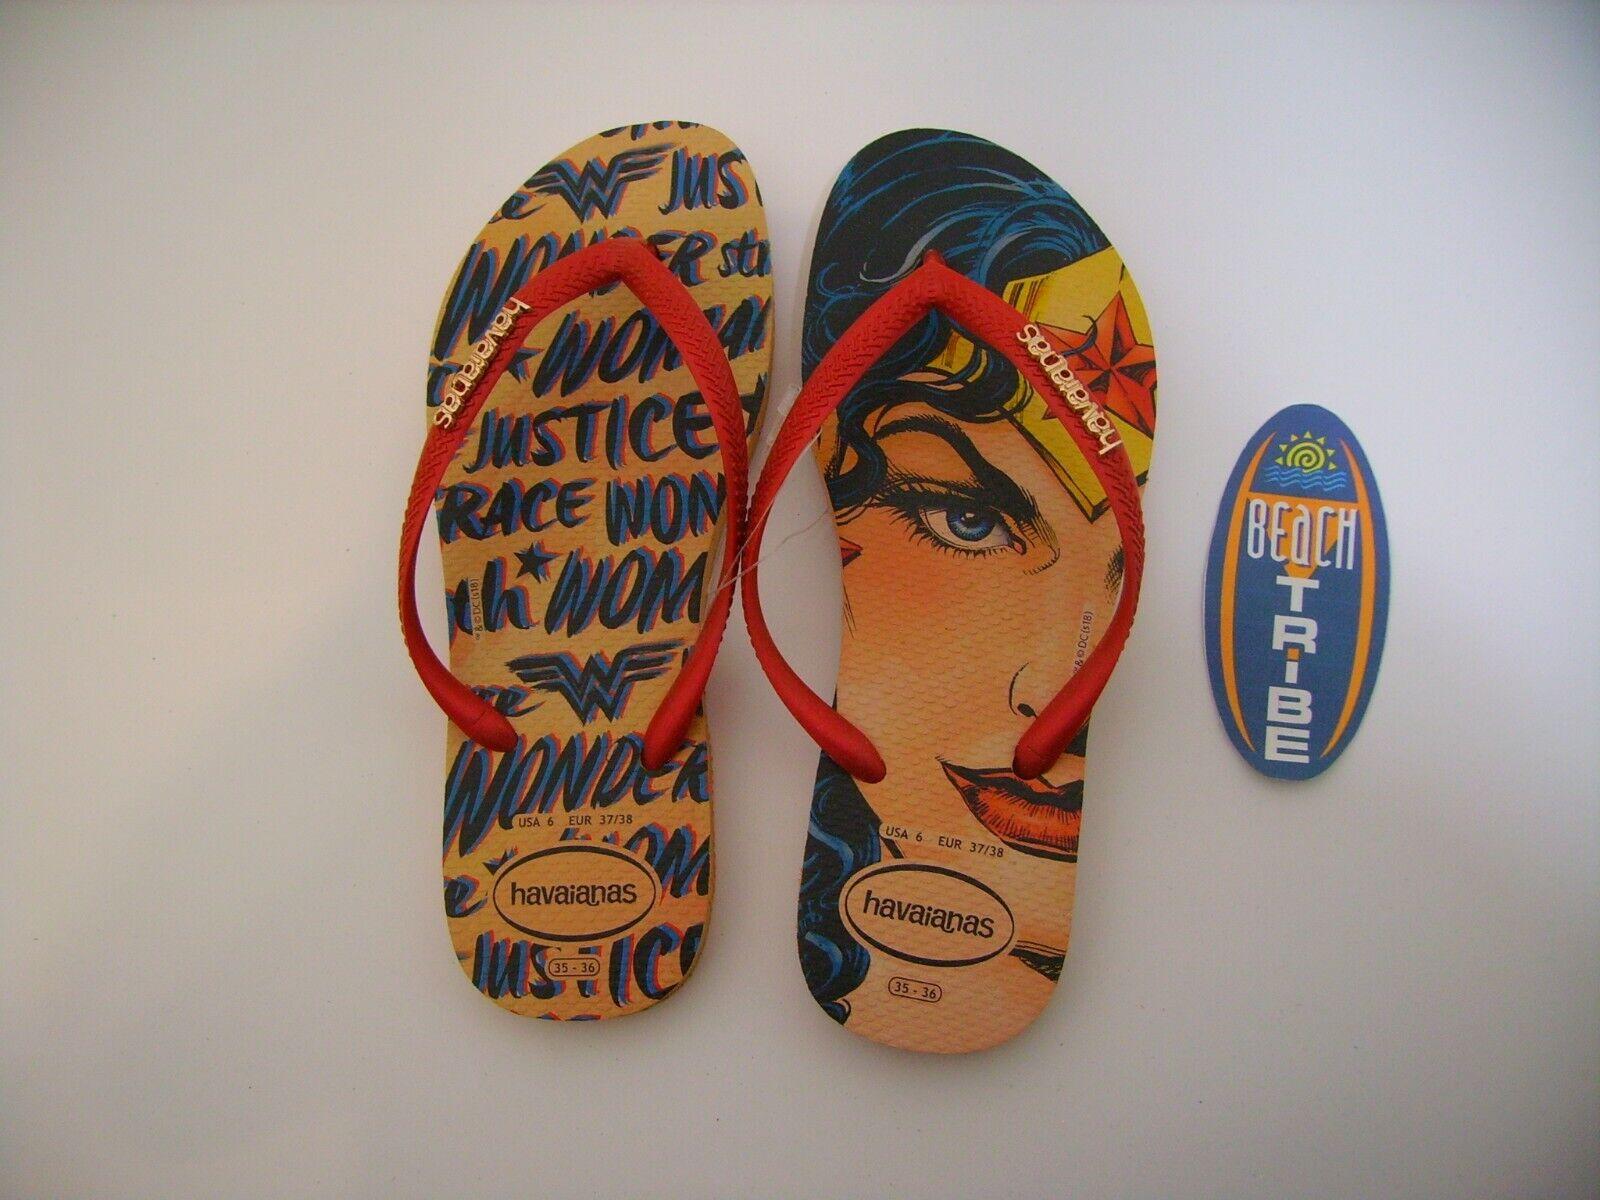 474cc2d90c830 Havaianas Ciabatta Infradito women Slim Nude red Heroinas noztqh101 ...